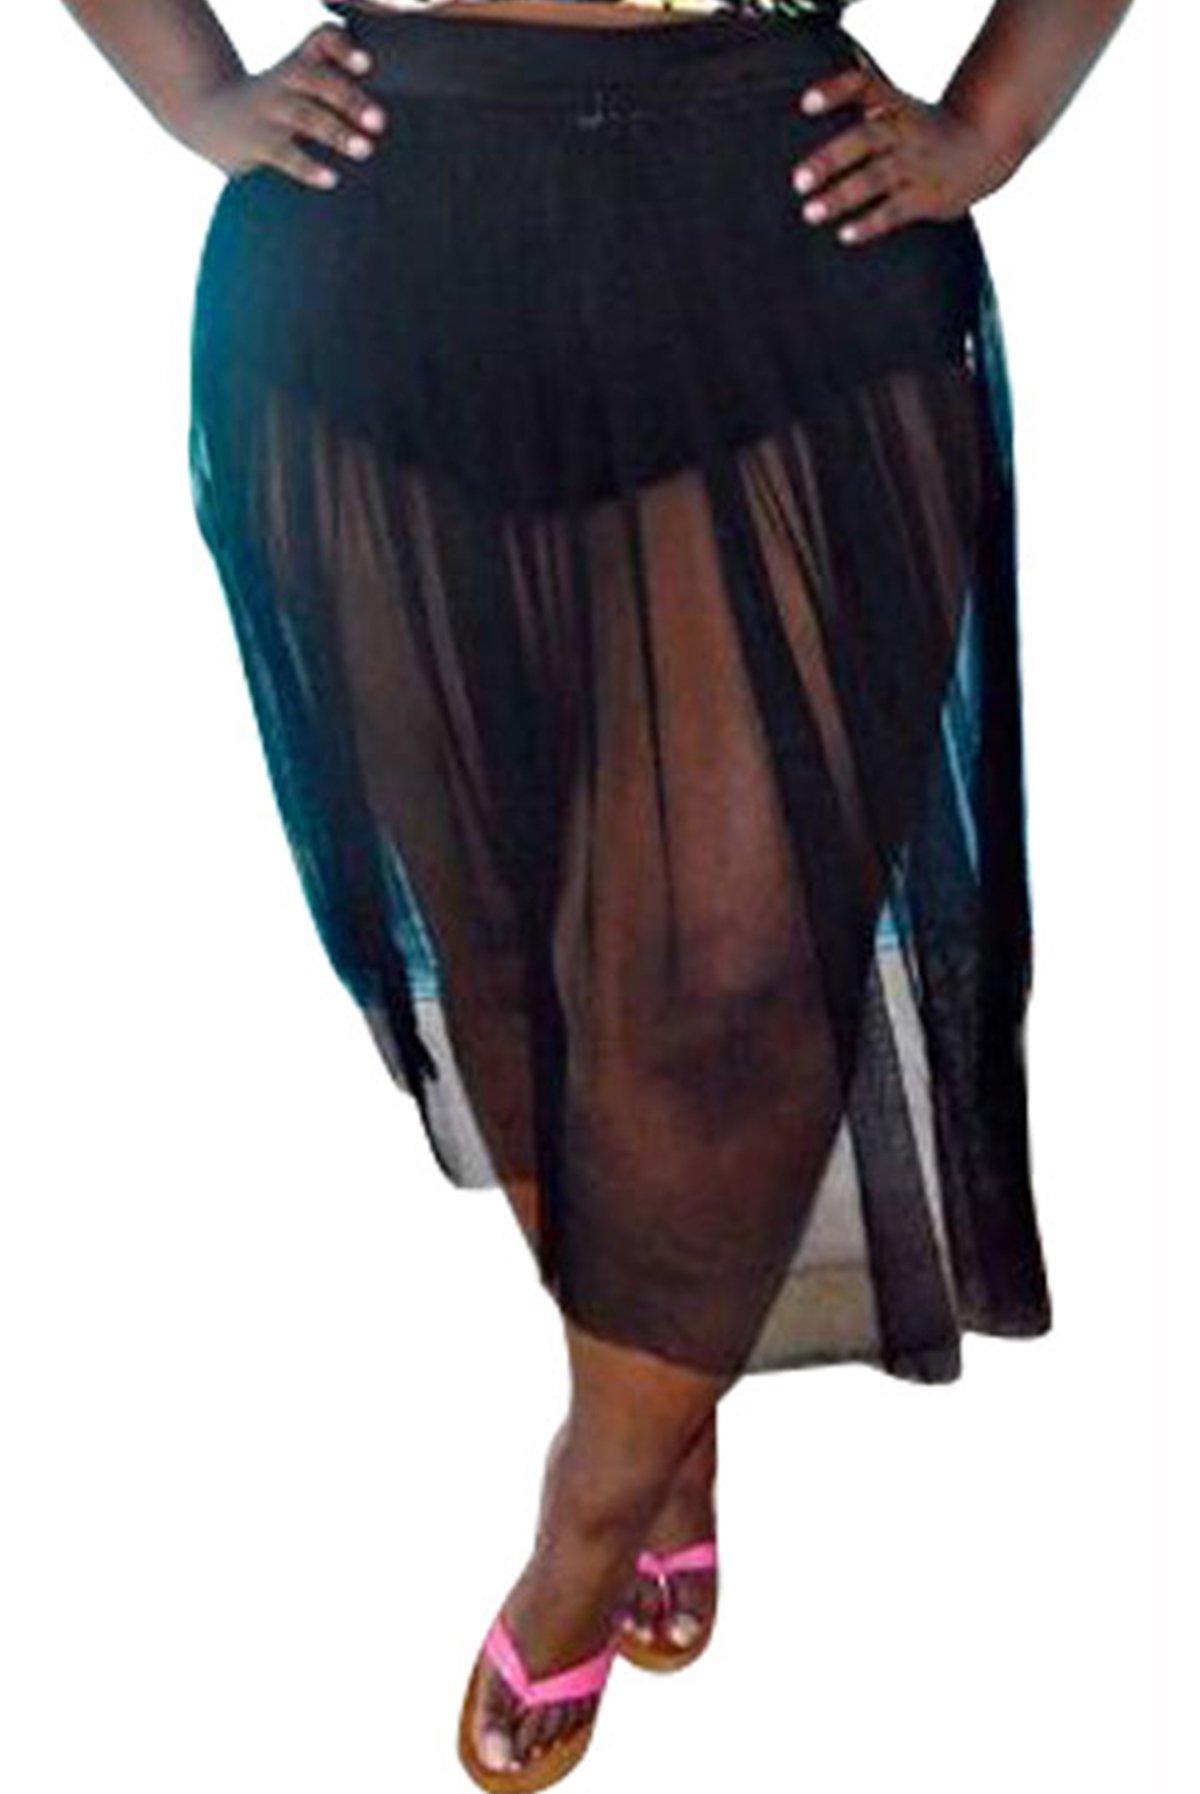 JYUAN Women's Plus Size Swimwear High Waist Bikini Set Cover up Two Piece Swimsuit Floral Top Sheer Mesh Skirt (2XL, Black Mesh Skirt Bottom)